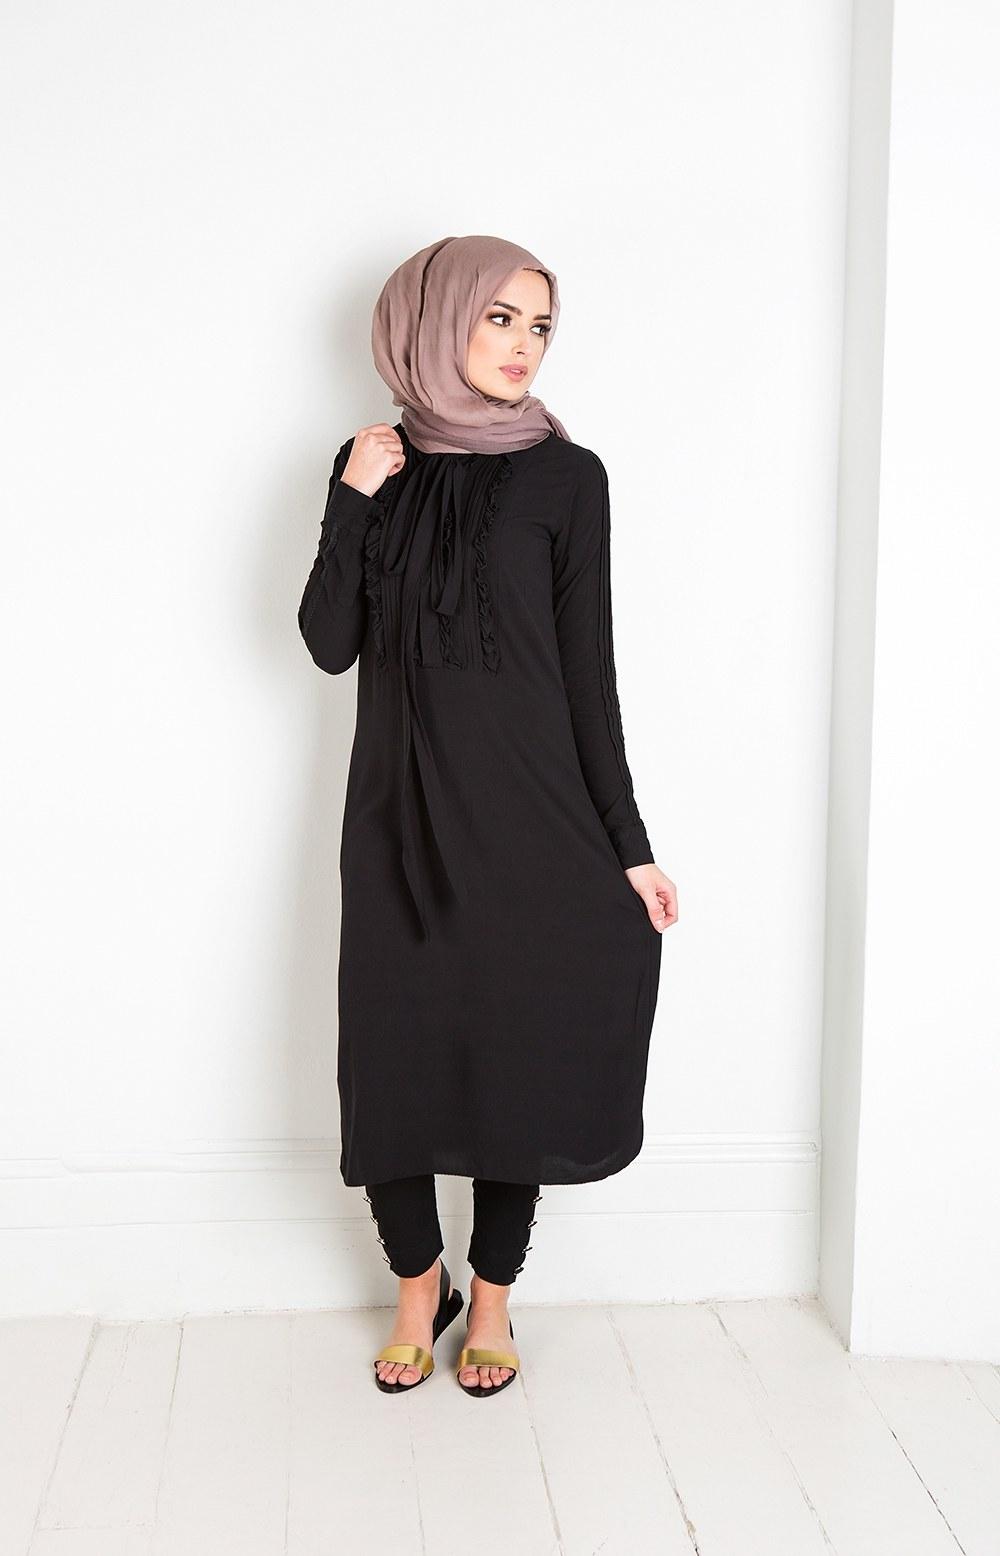 Model Model Baju Lebaran 2018 Wanita 9ddf 25 Trend Model Baju Muslim Lebaran 2018 Simple & Modis